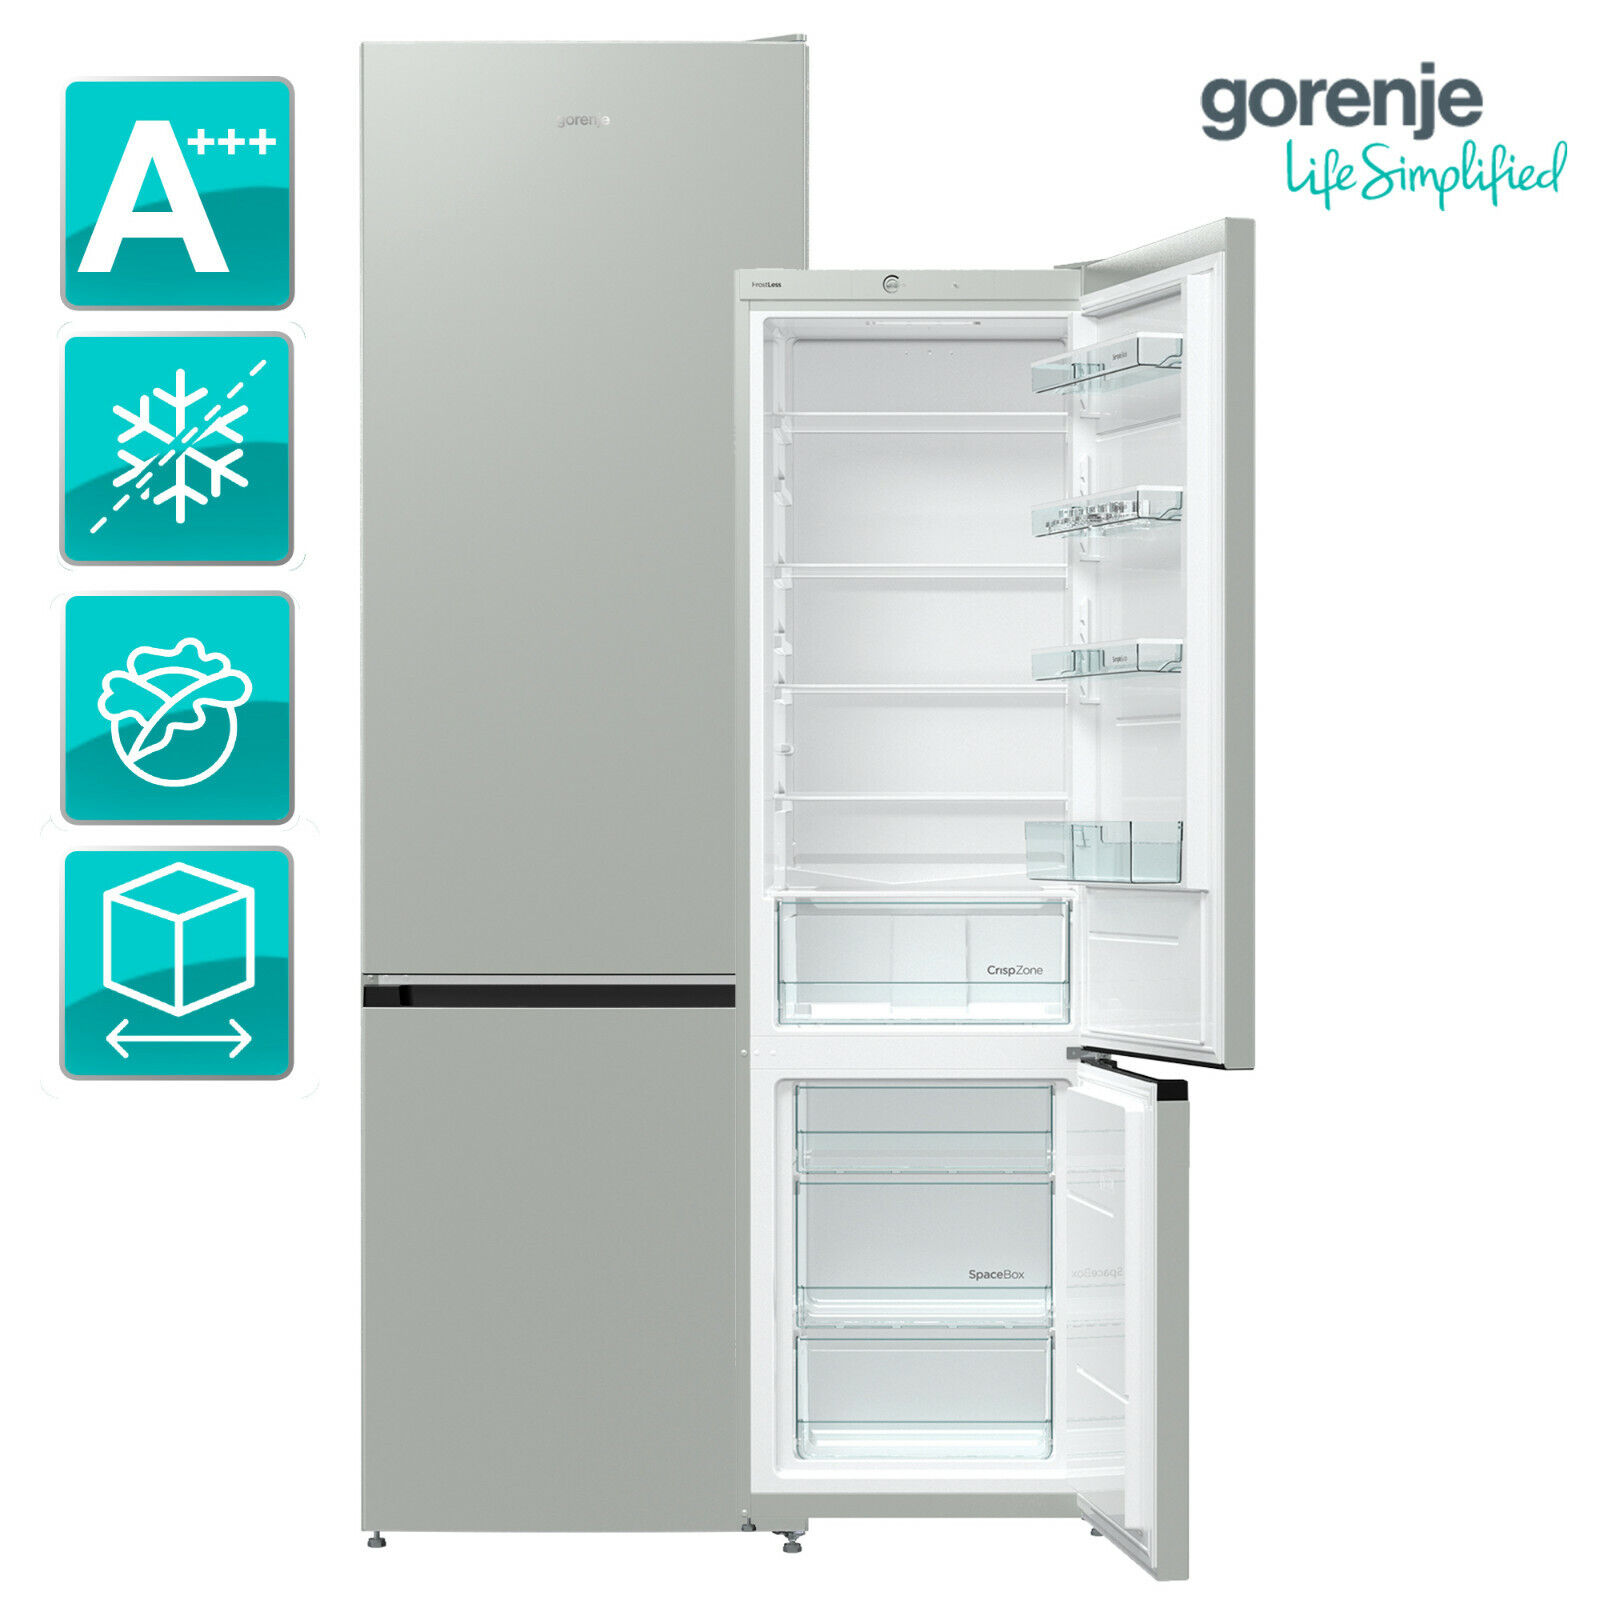 Kühlschrank Kühl-Gefrierkombination A+++ Gorenje RK623PS4 grau metallic